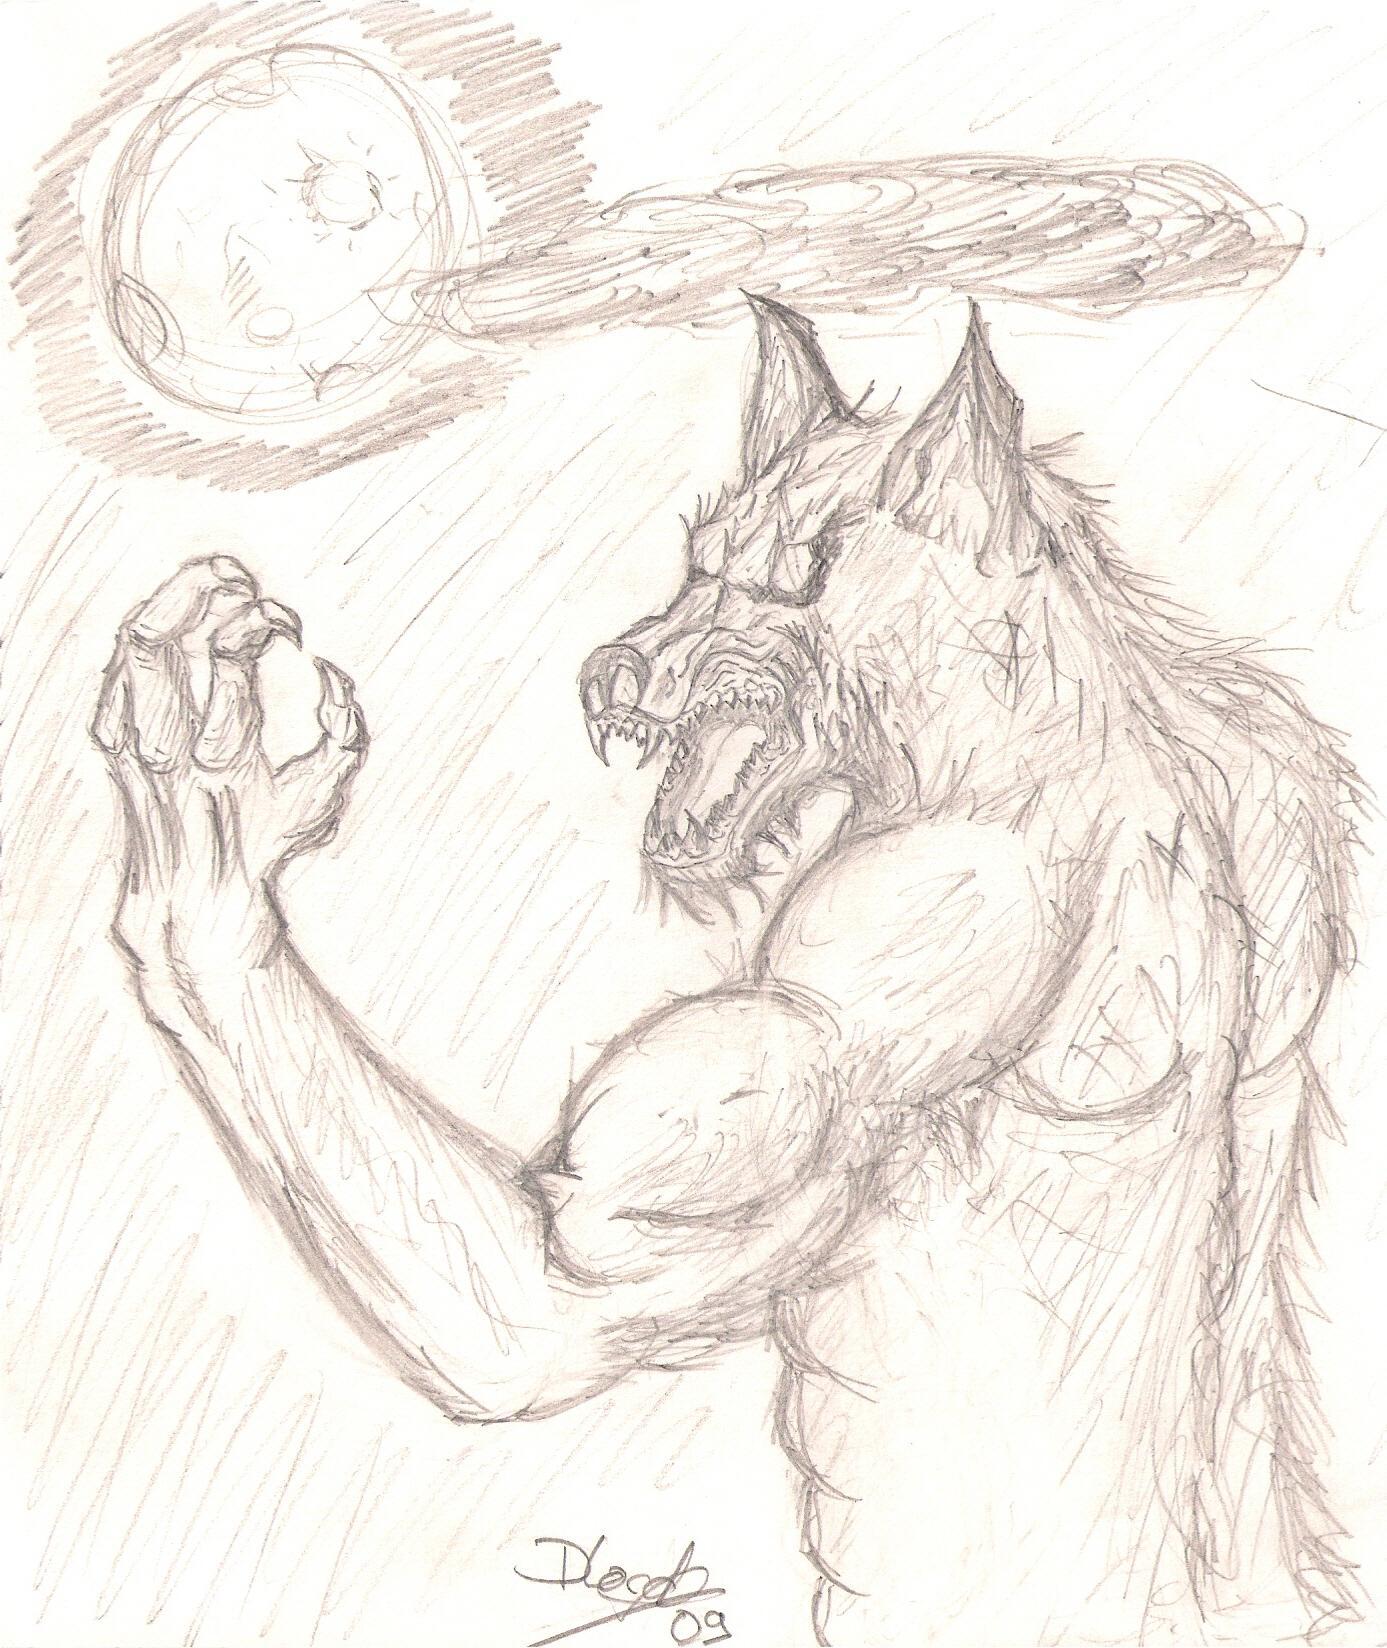 Impressionnant image a imprimer de loup - Dessin loup garou ...